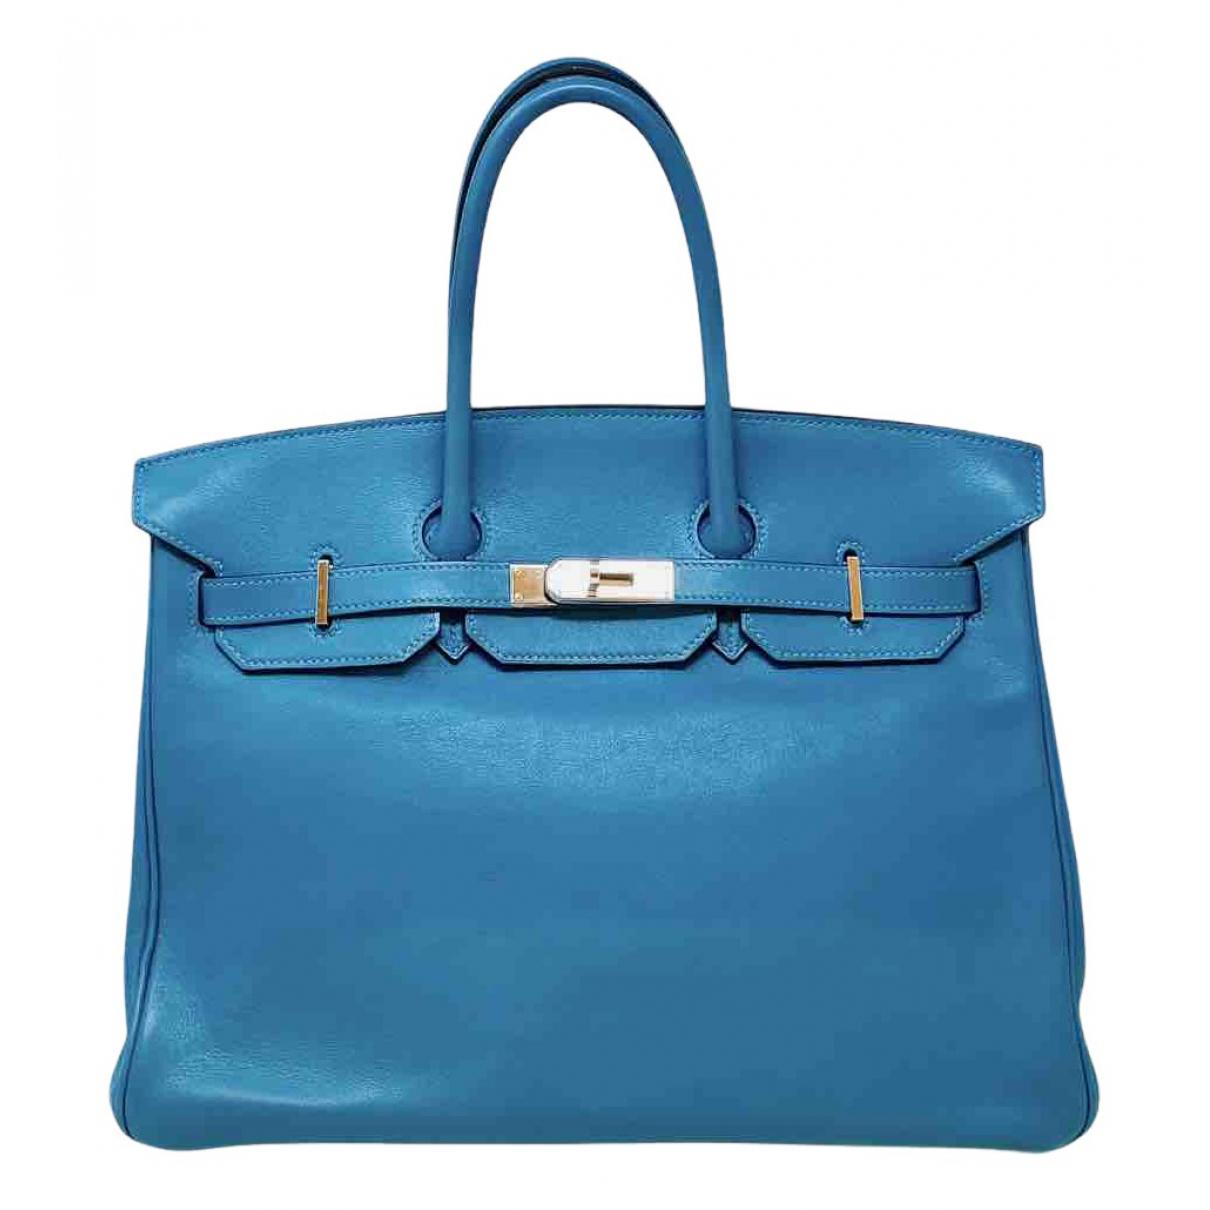 Hermès Birkin 35 Blue Leather handbag for Women N